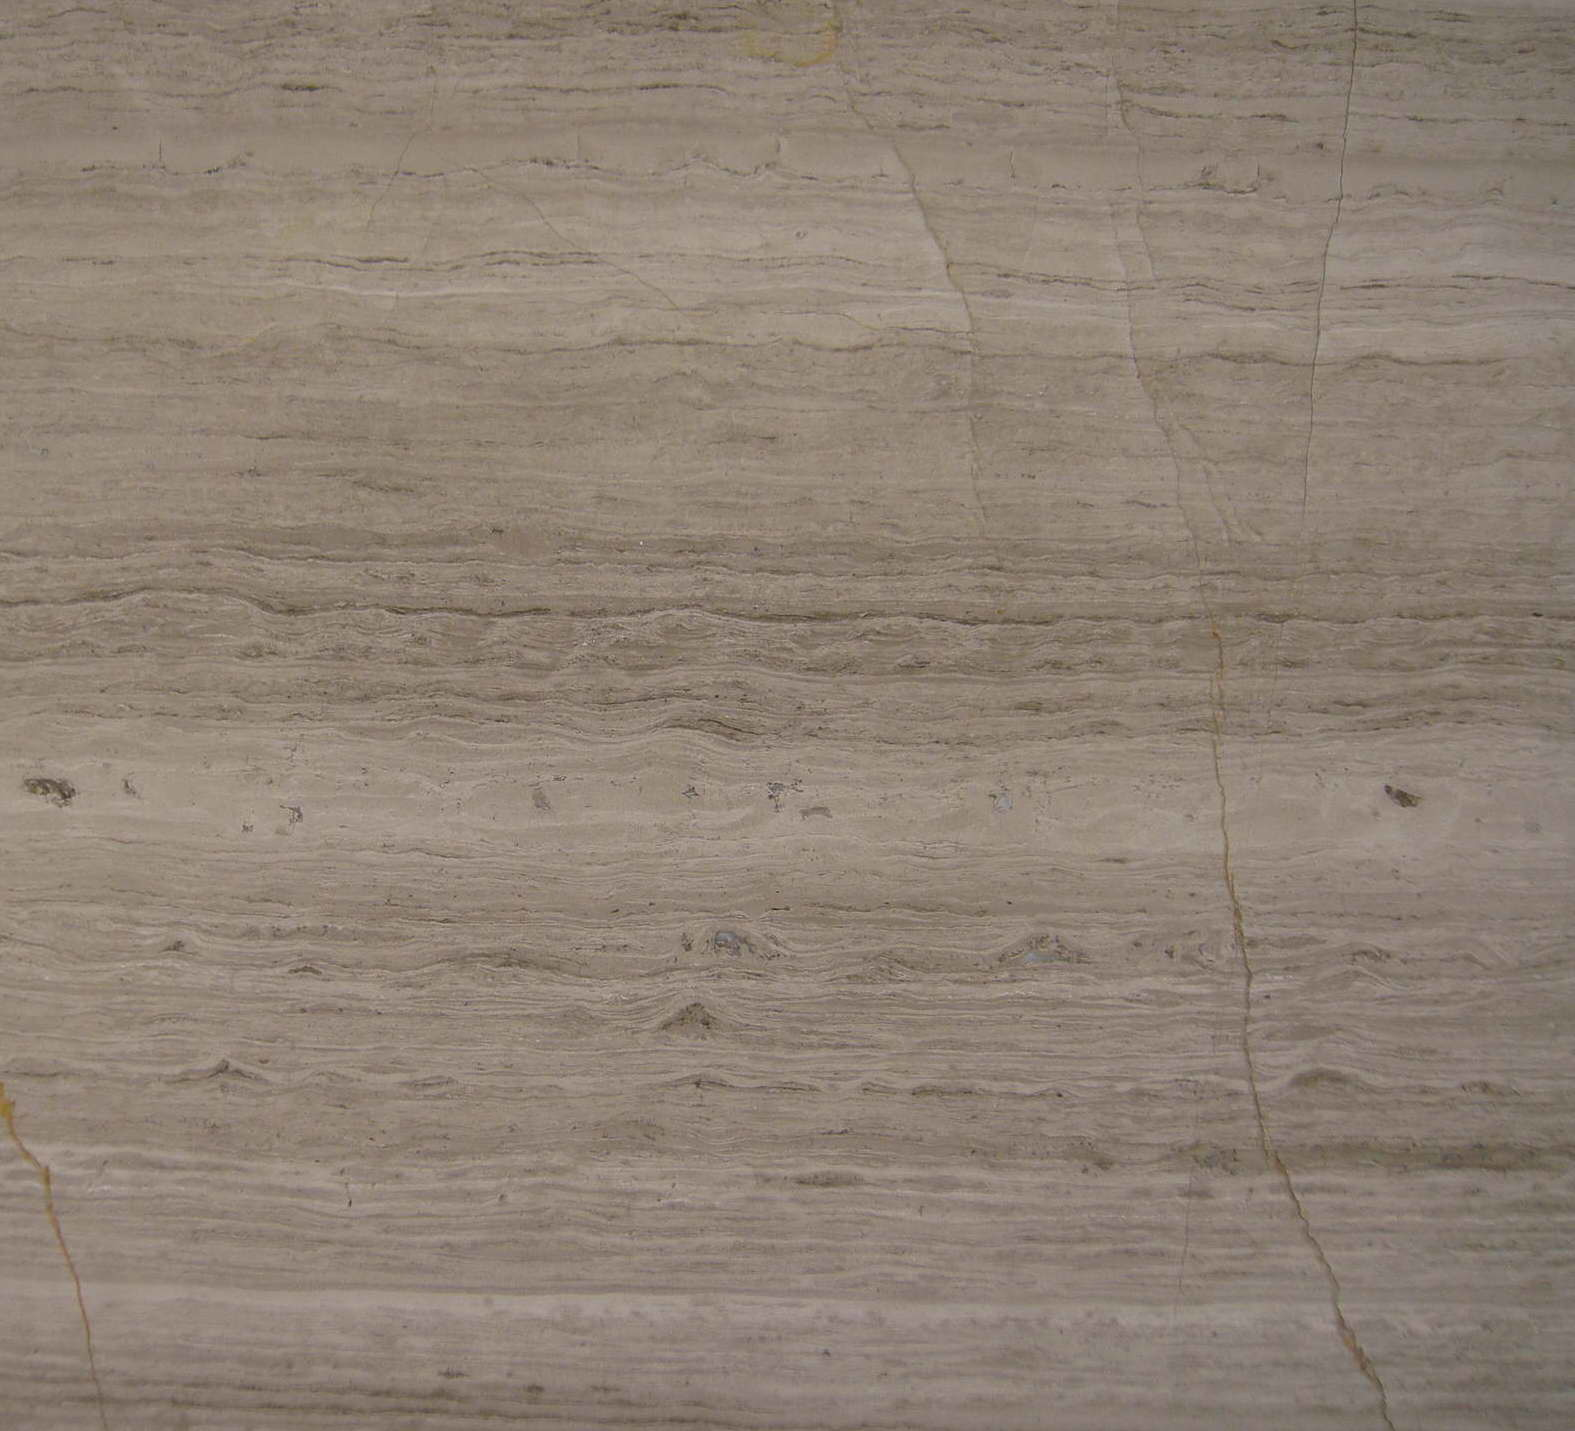 M rmol chino gris de madera m rmol chino gris de madera for Marmol color madera